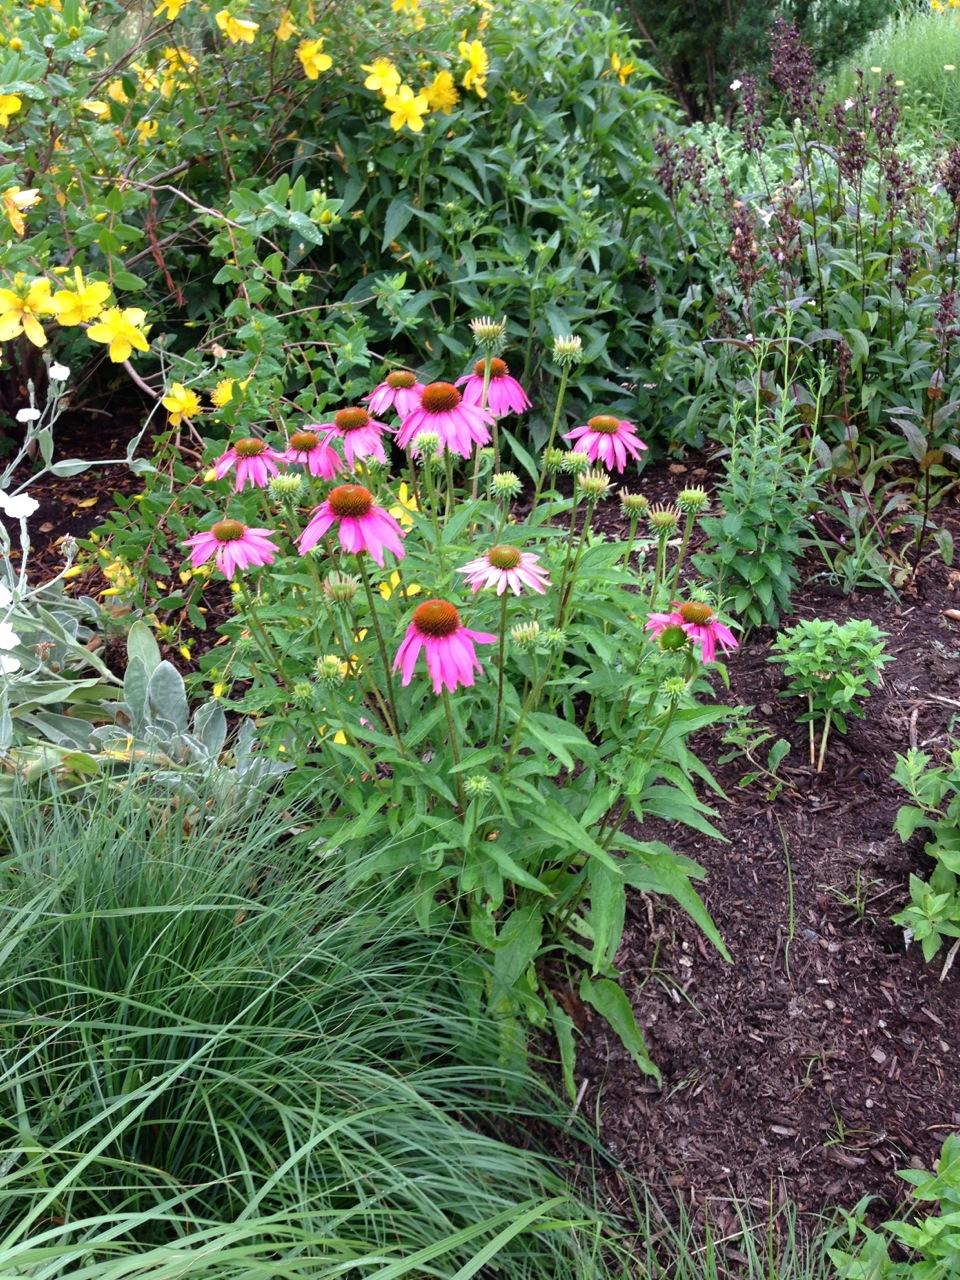 The summer perennial garden will bloom again.